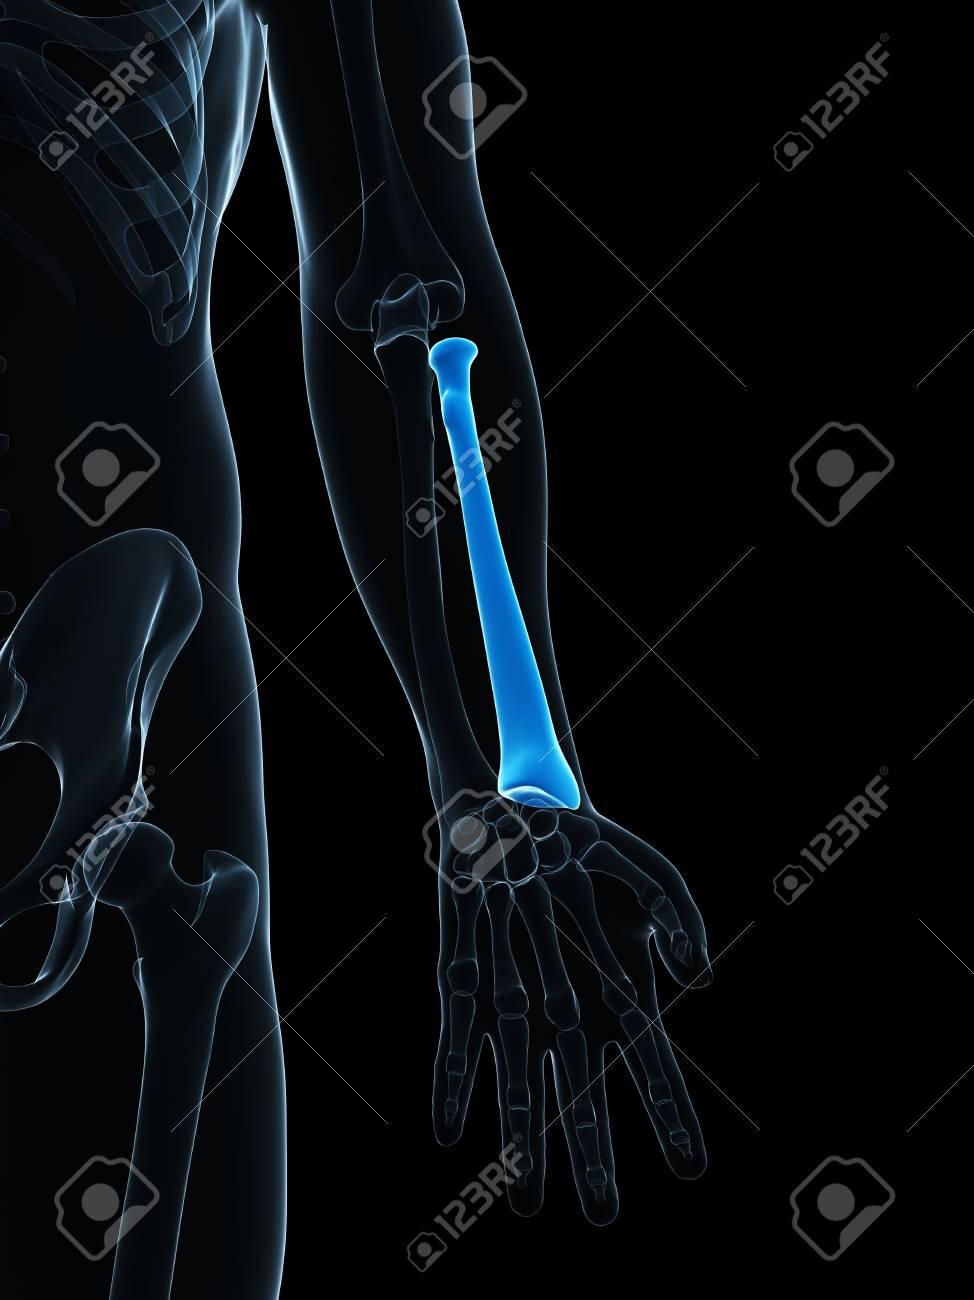 Lower Arm Bone Computer Artwork Showing The Radius Bone Stock Photo